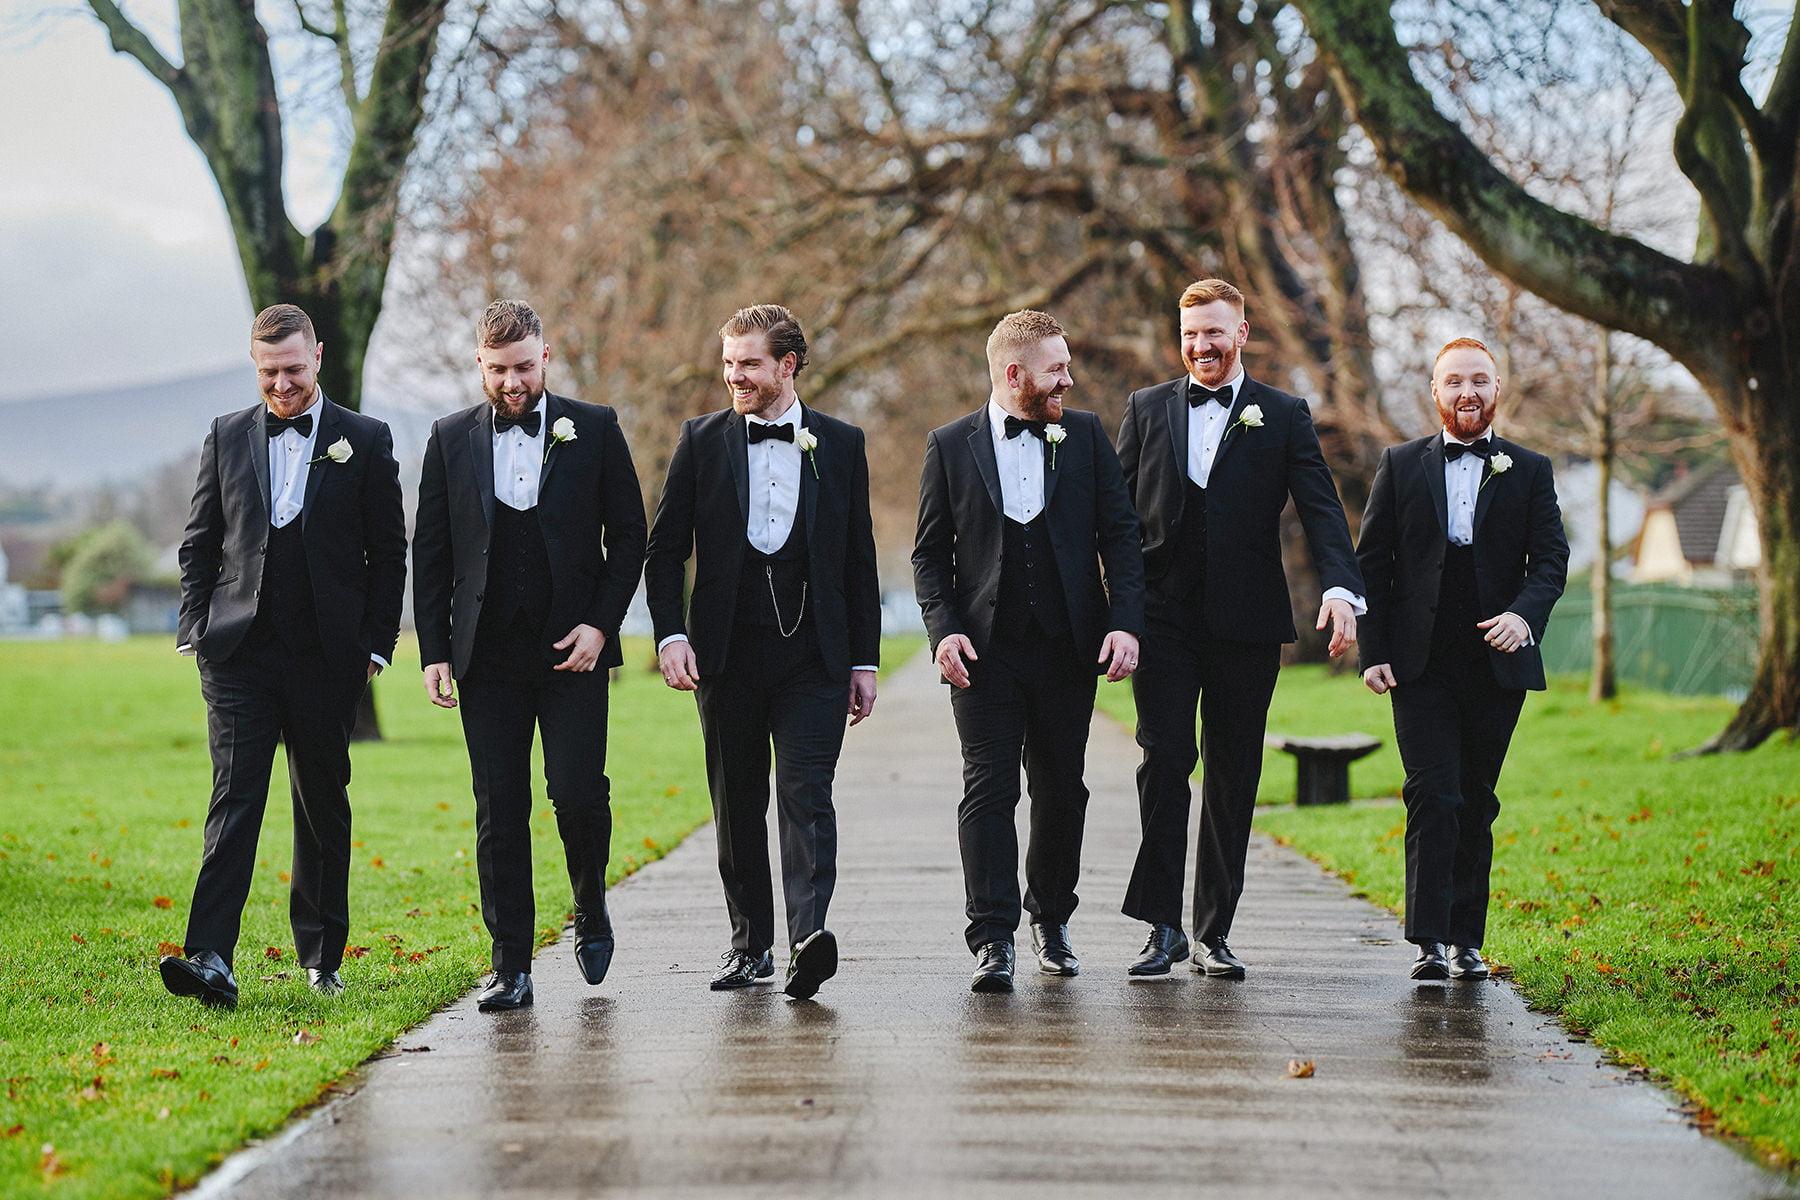 POWERSCOURT HOTEL RESORT INTIMATE WEDDING 25